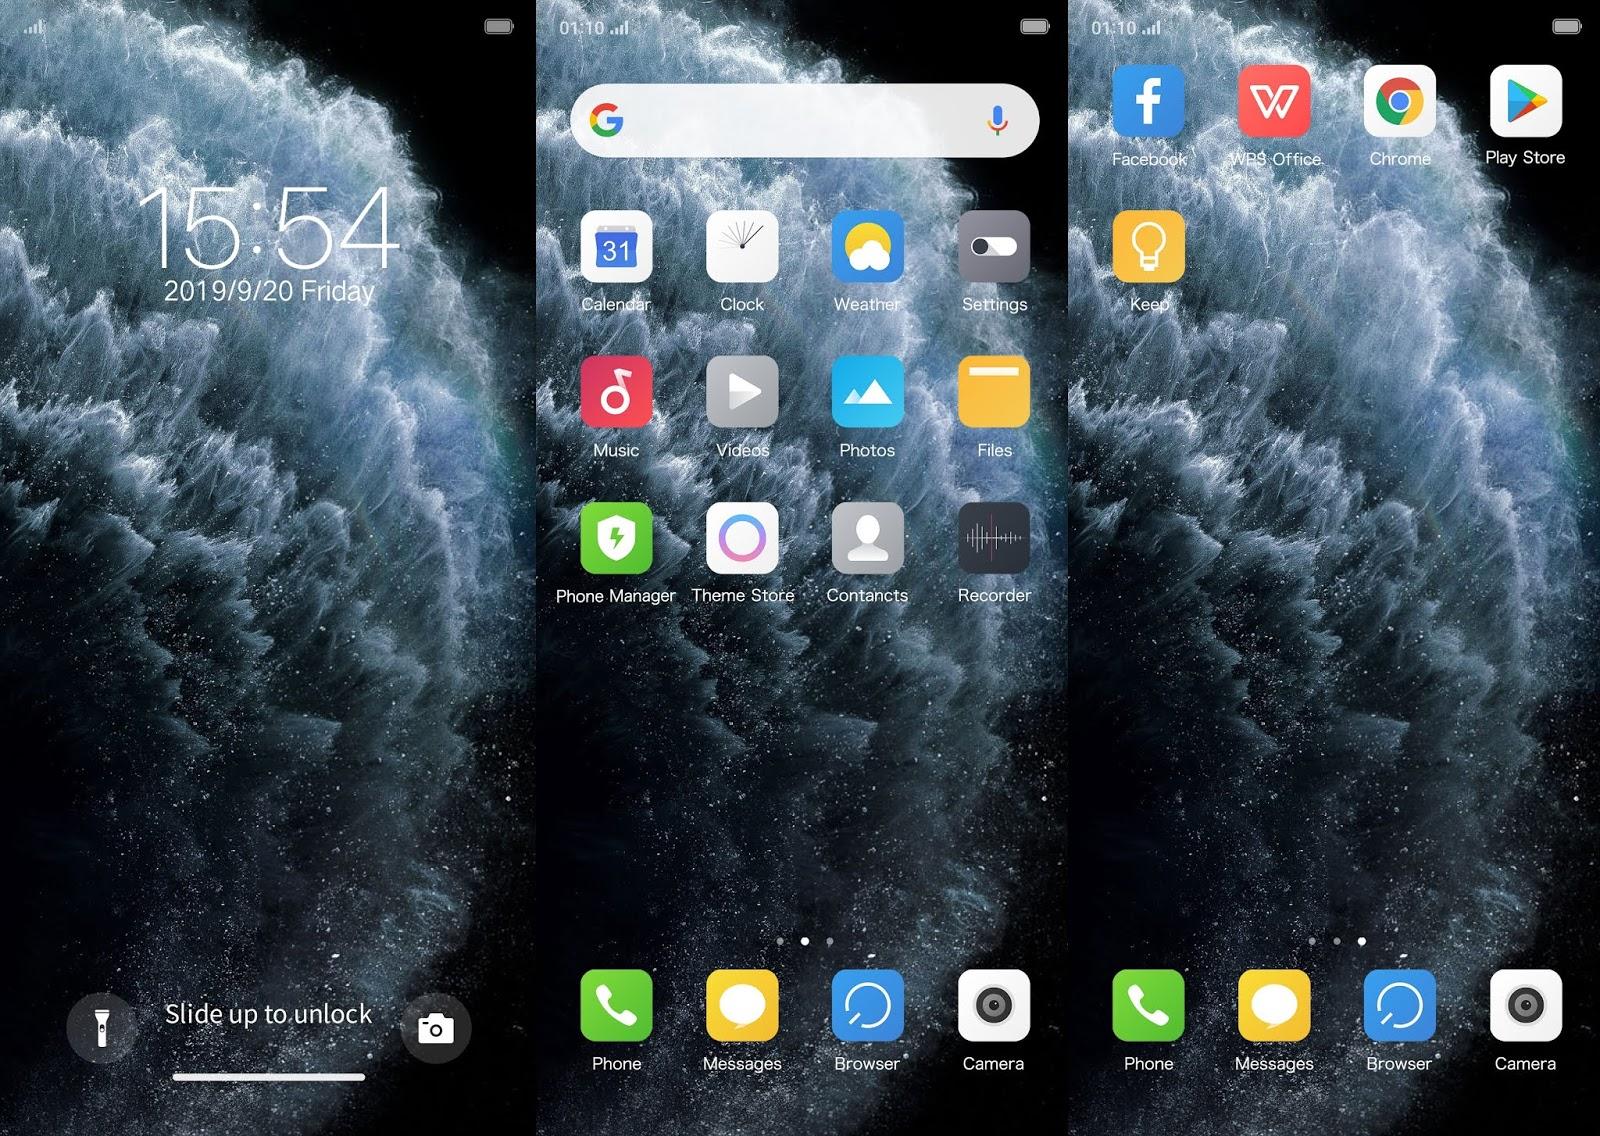 Themes iPhone 11 Pro Max UI Premium for OPPO & Realme